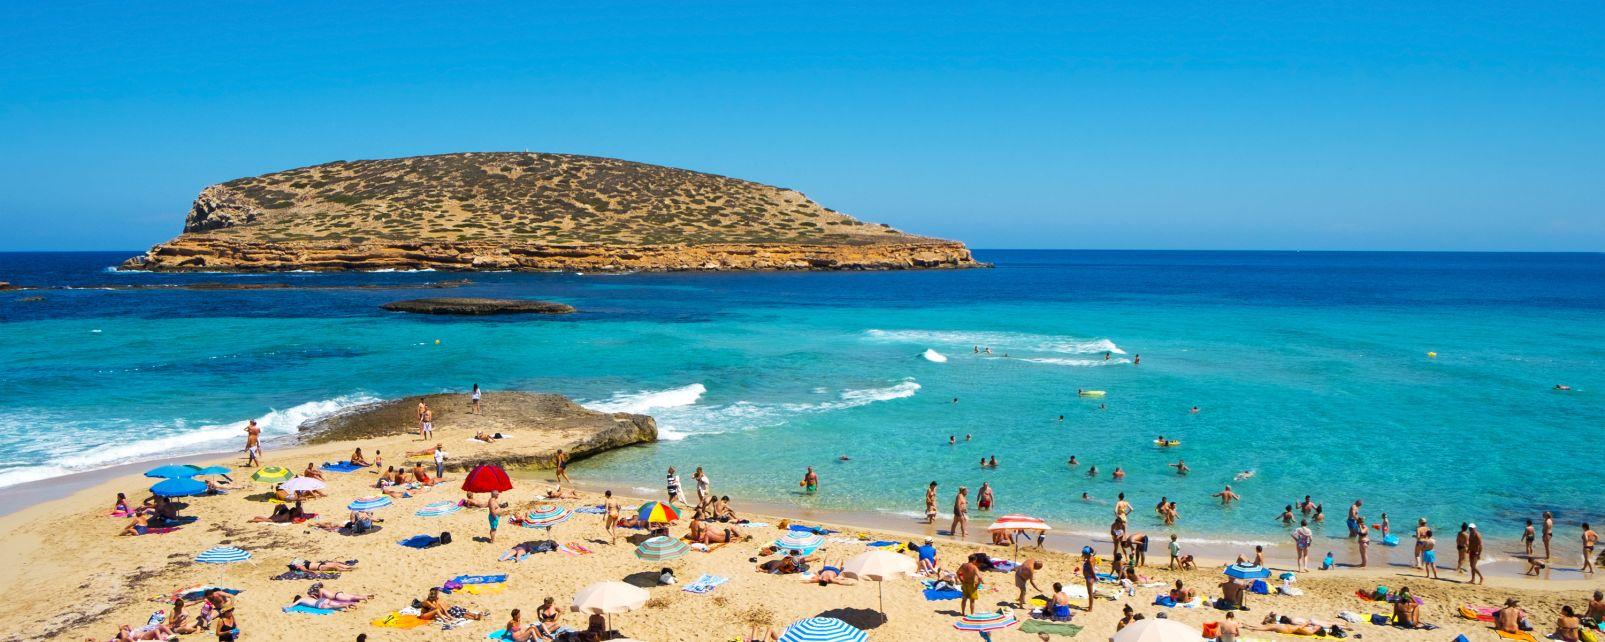 Les côtes, ibiza, île, baléares, espagne, europe, mer, méditerranée, plage, Cala Conta